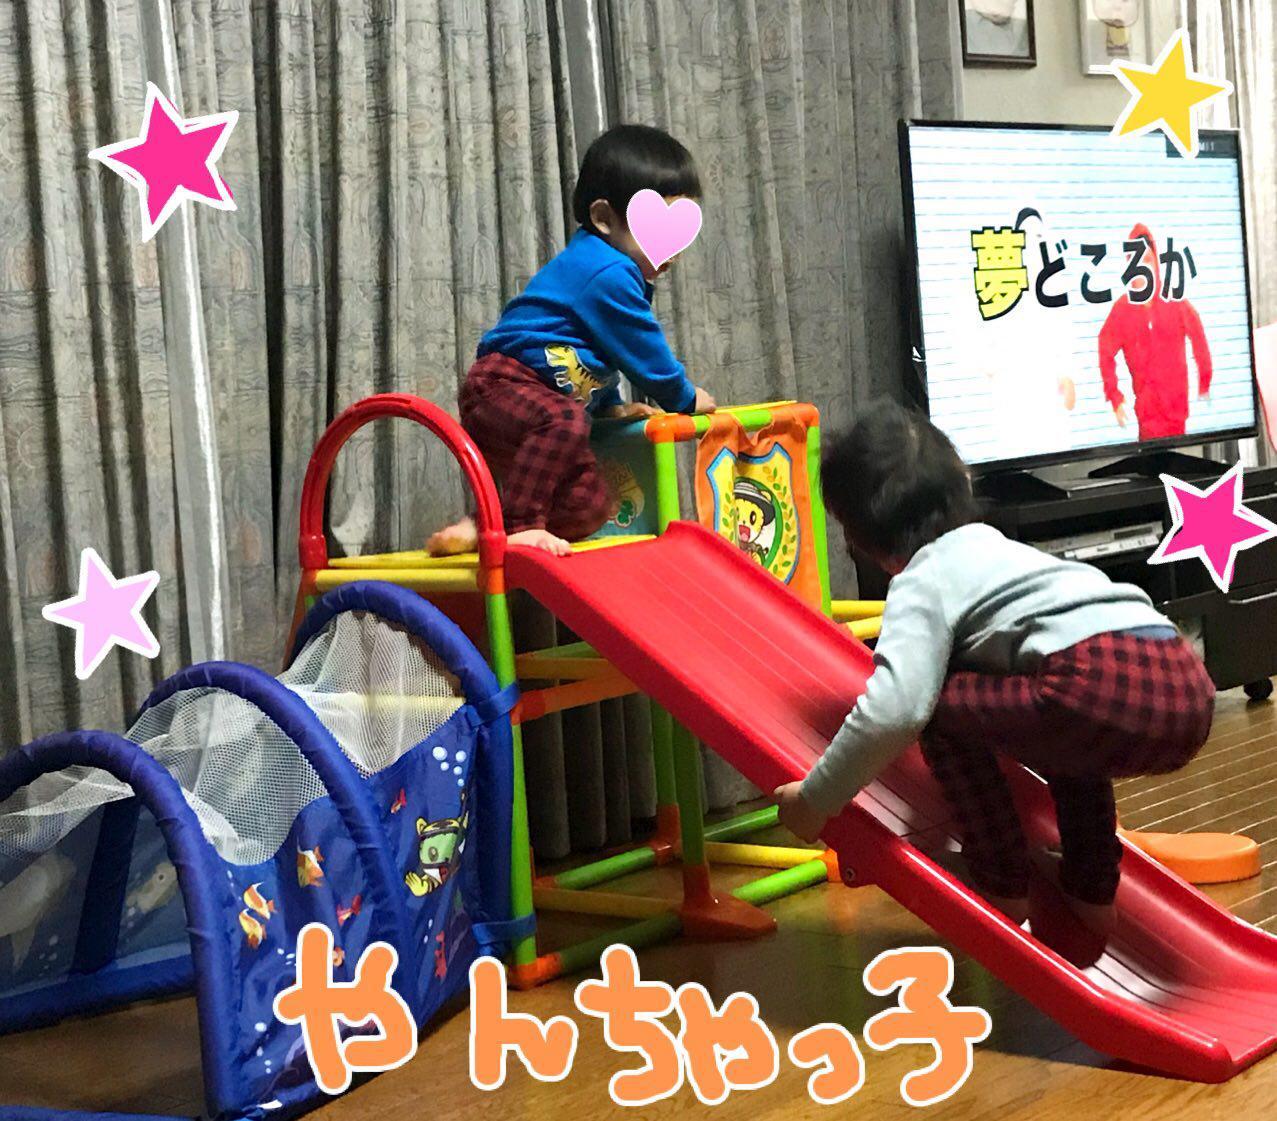 photo_2018-01-28_22-18-10.jpg